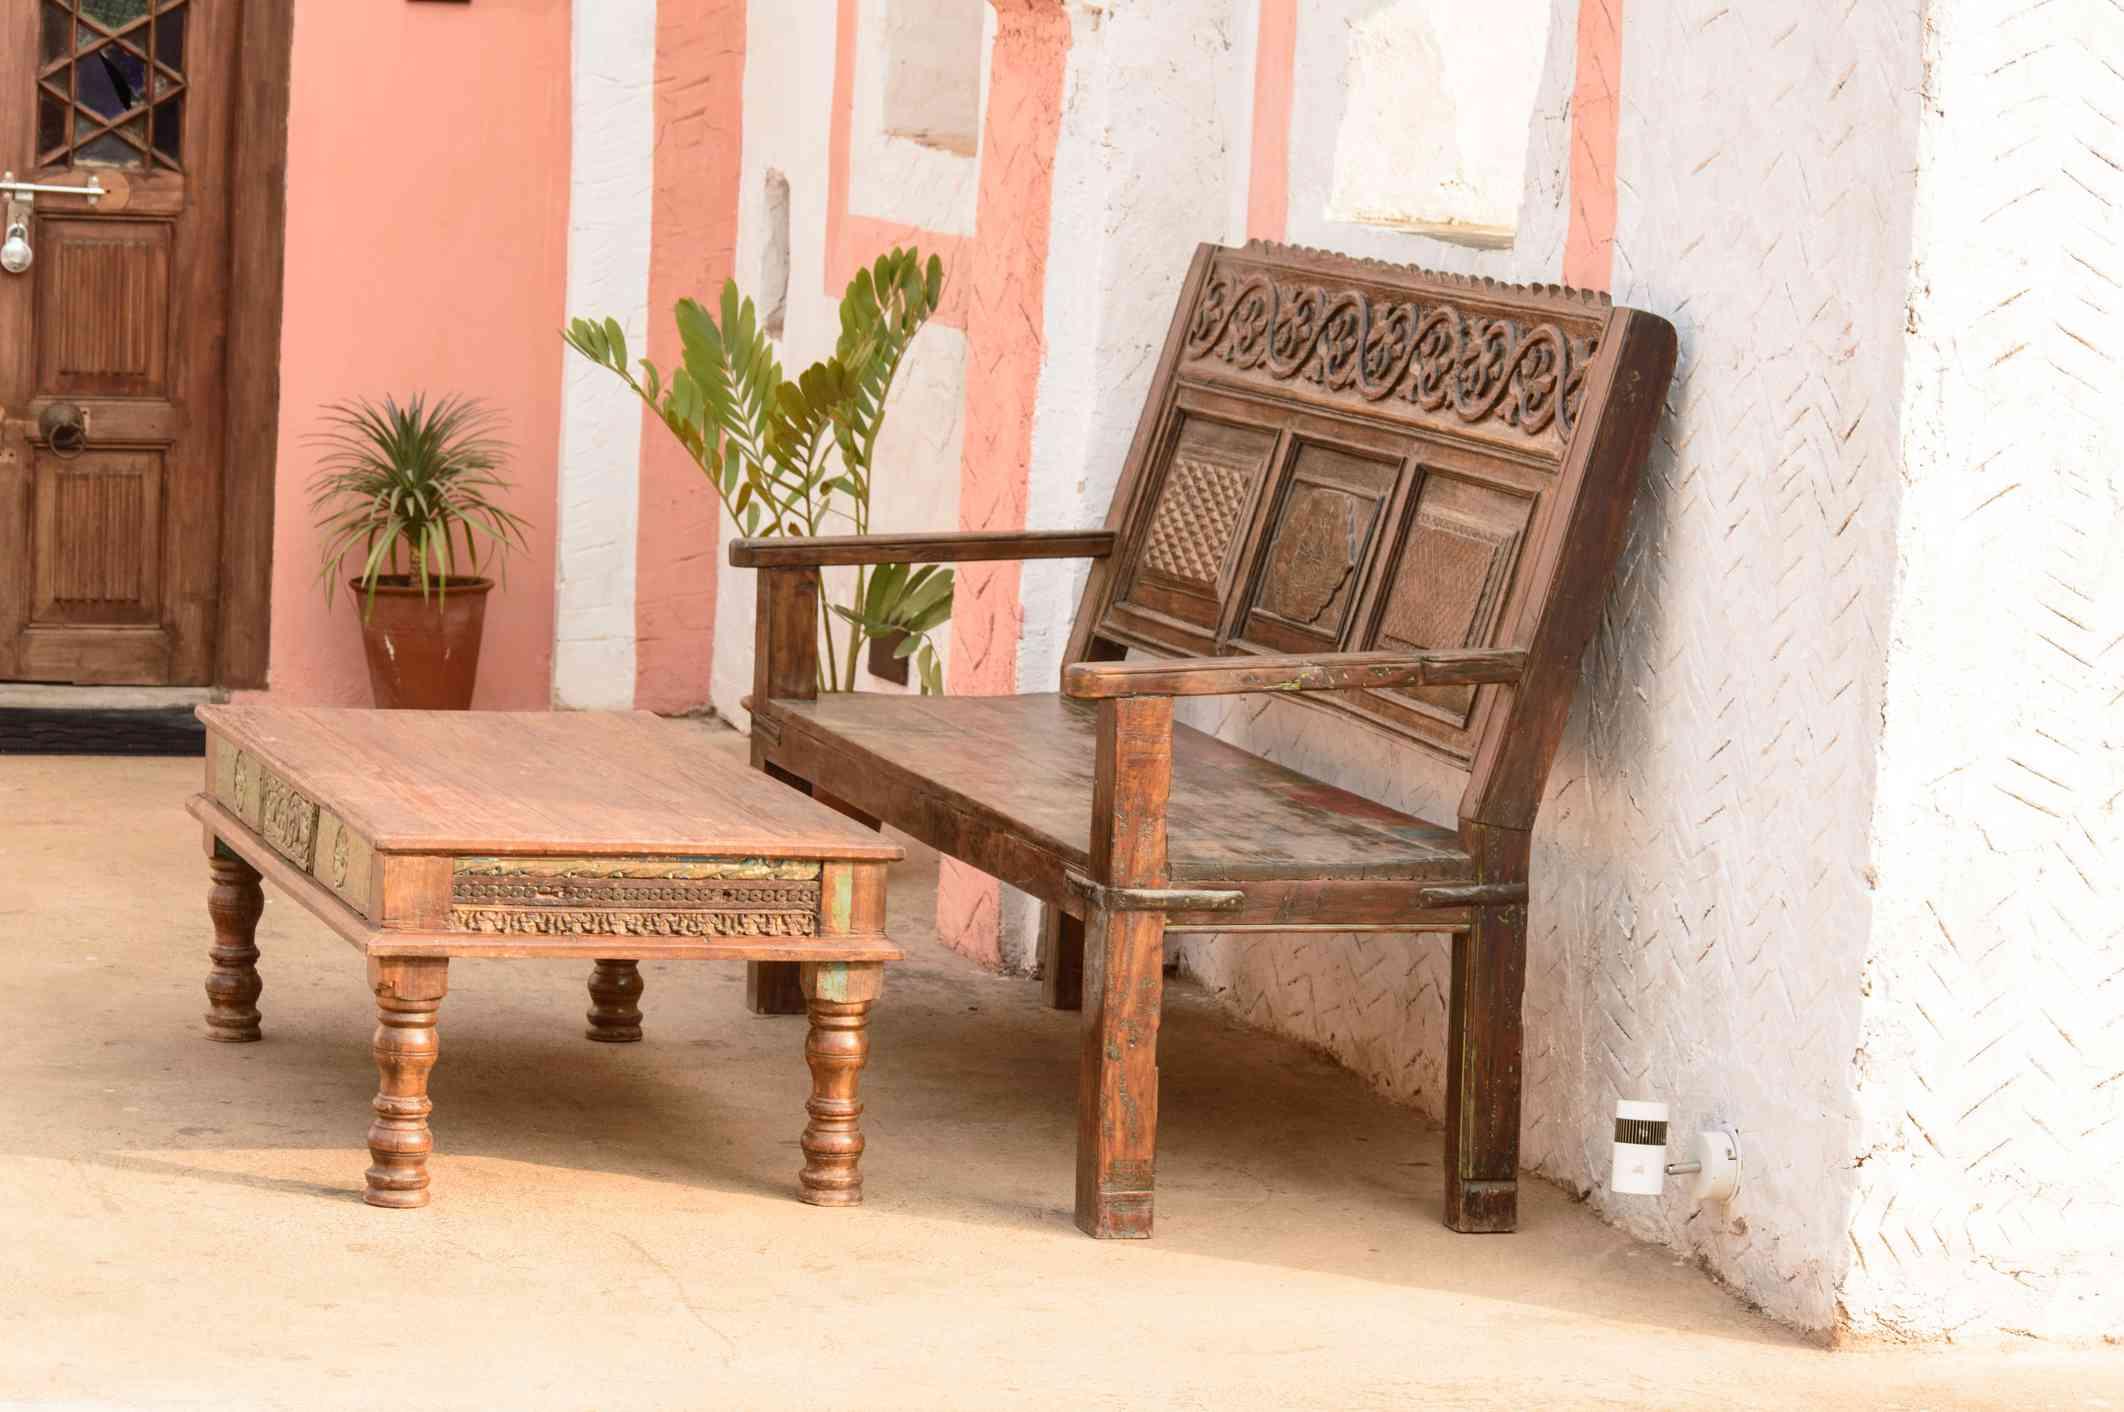 Muebles viejos de madera